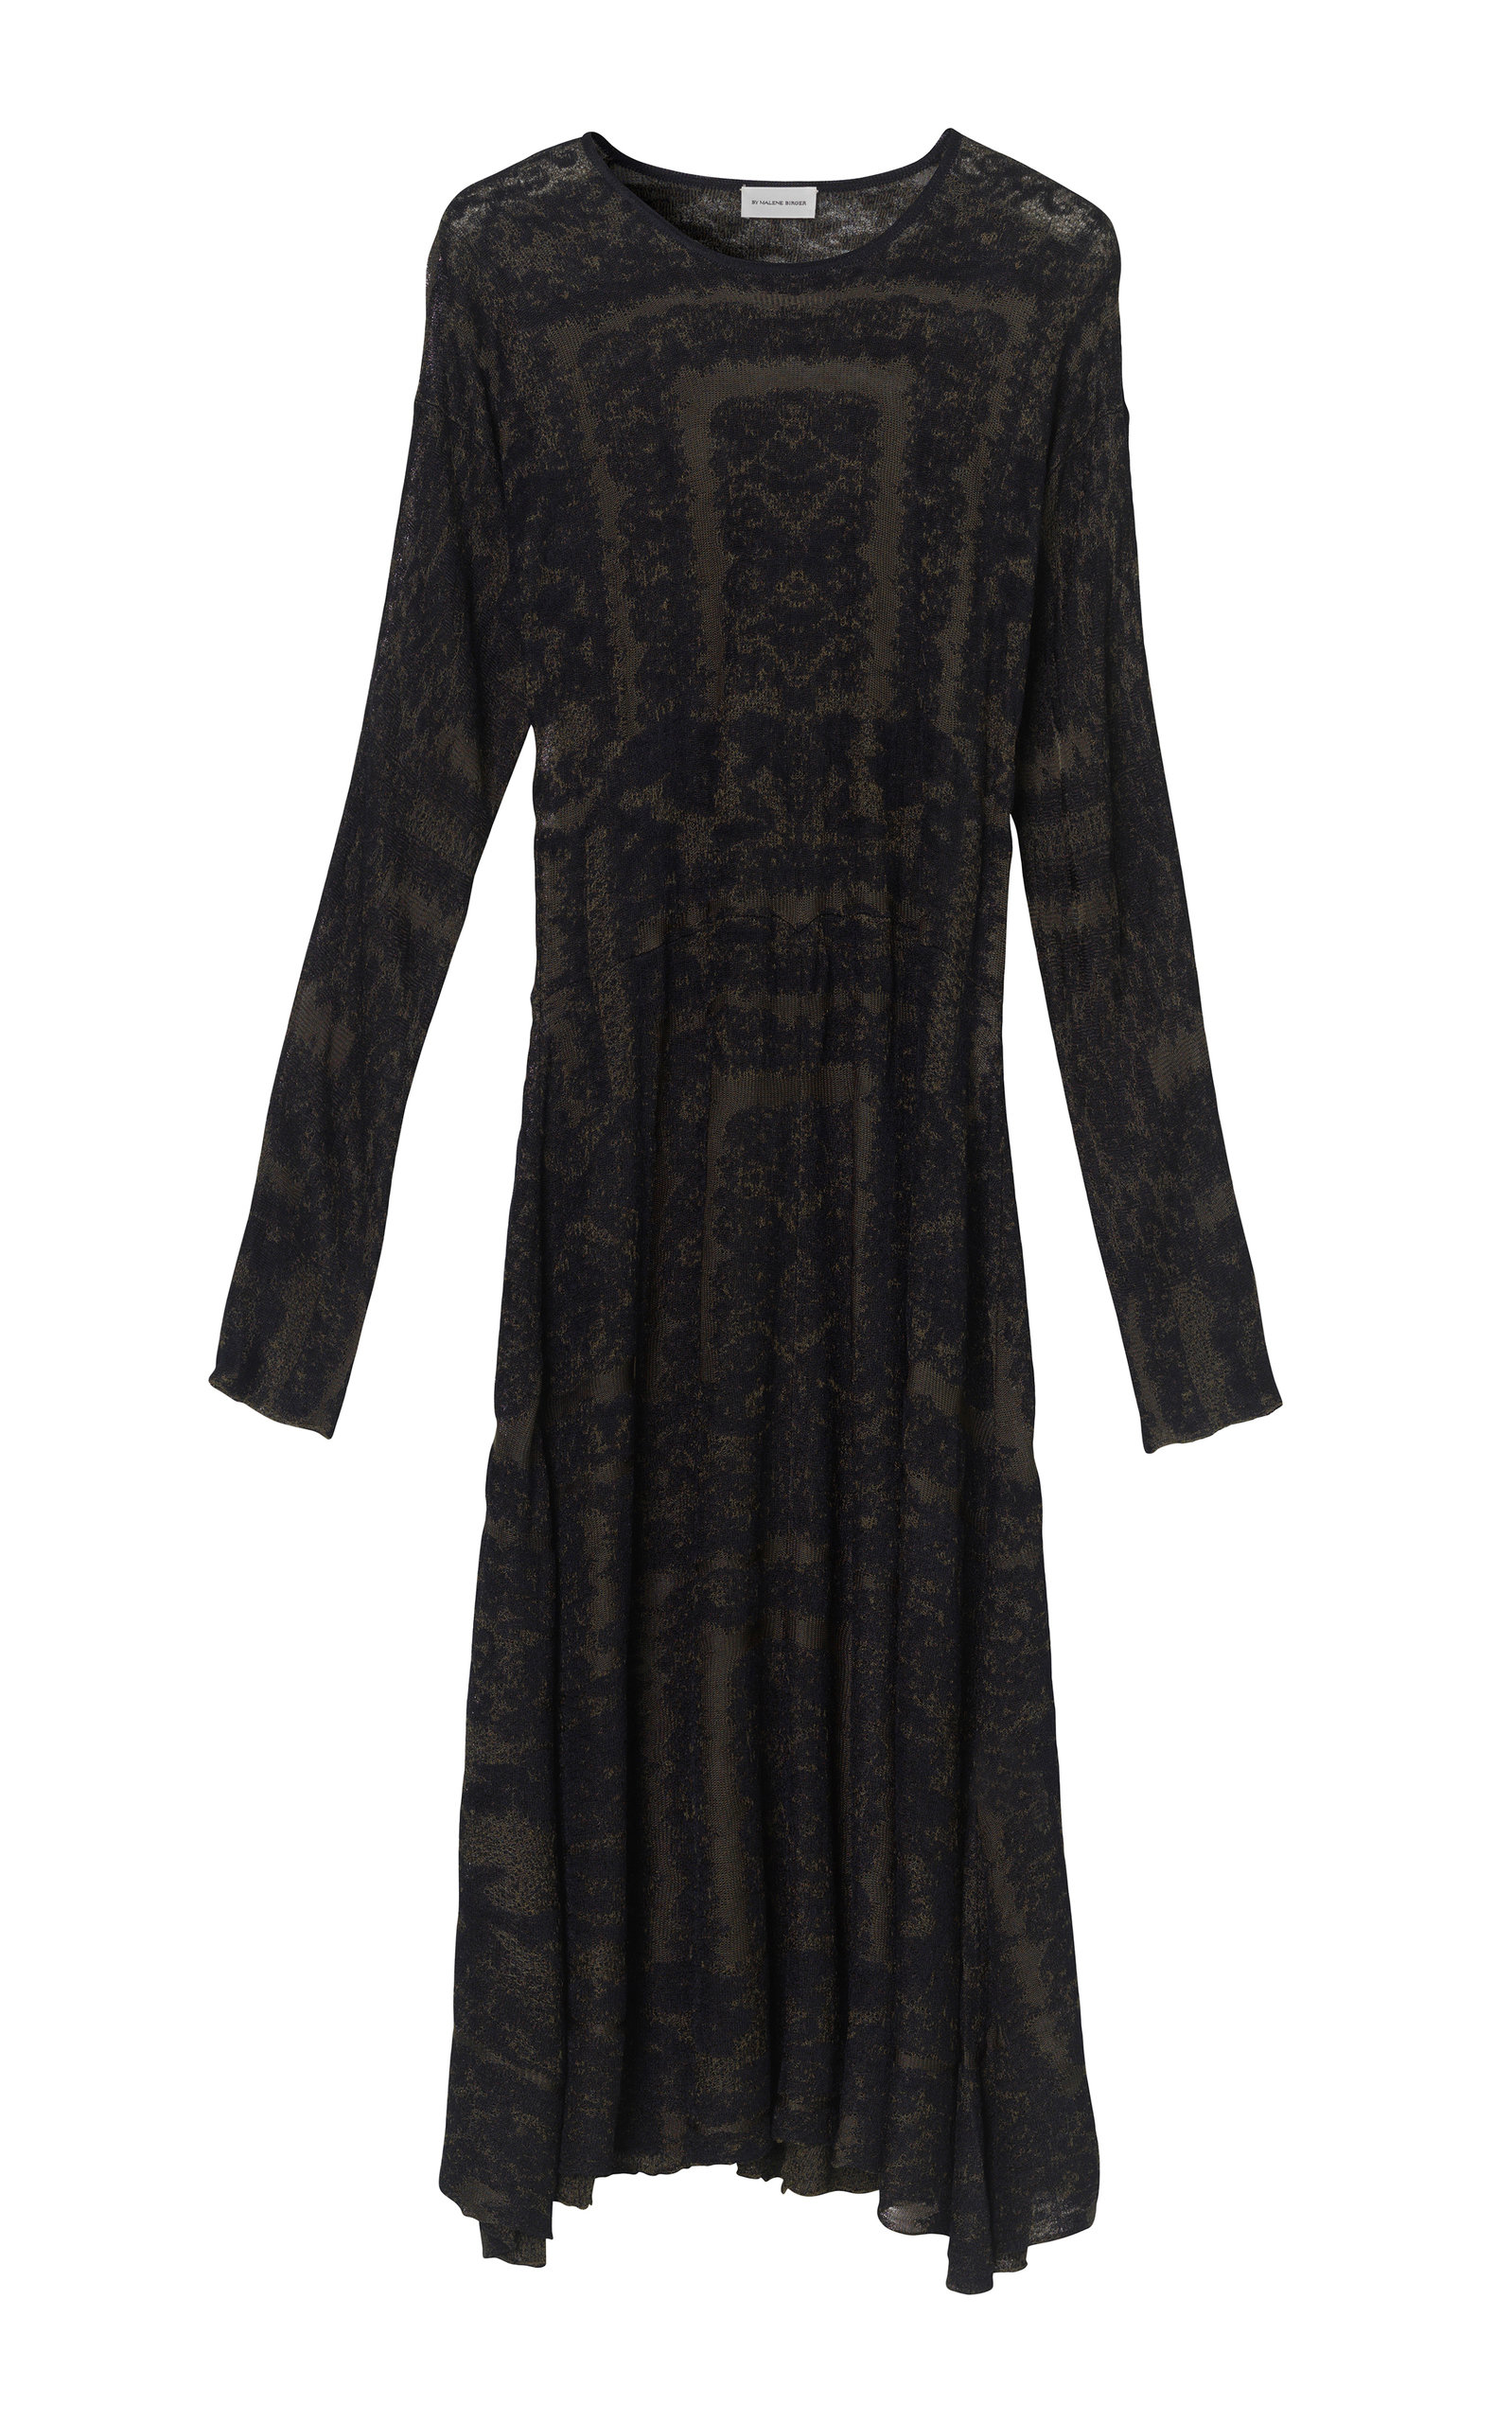 b7bb42887ecd Onix Viscose Jacquard Dress by By Malene Birger